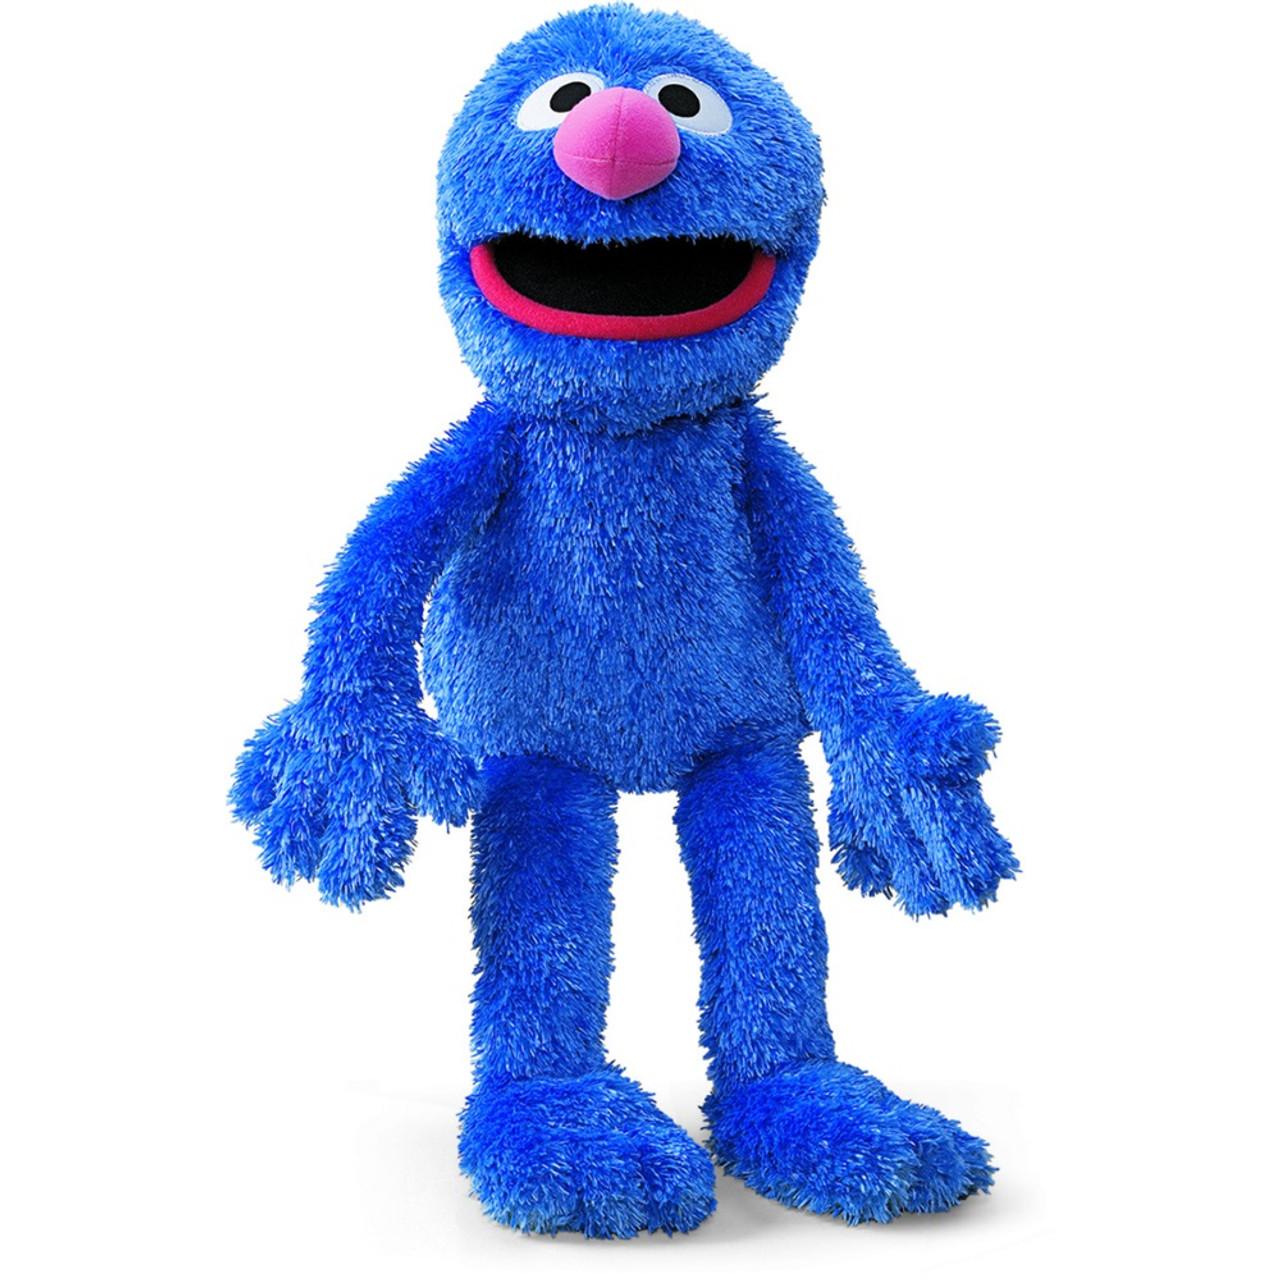 Sesame Street Grover 30cm Plush Toy